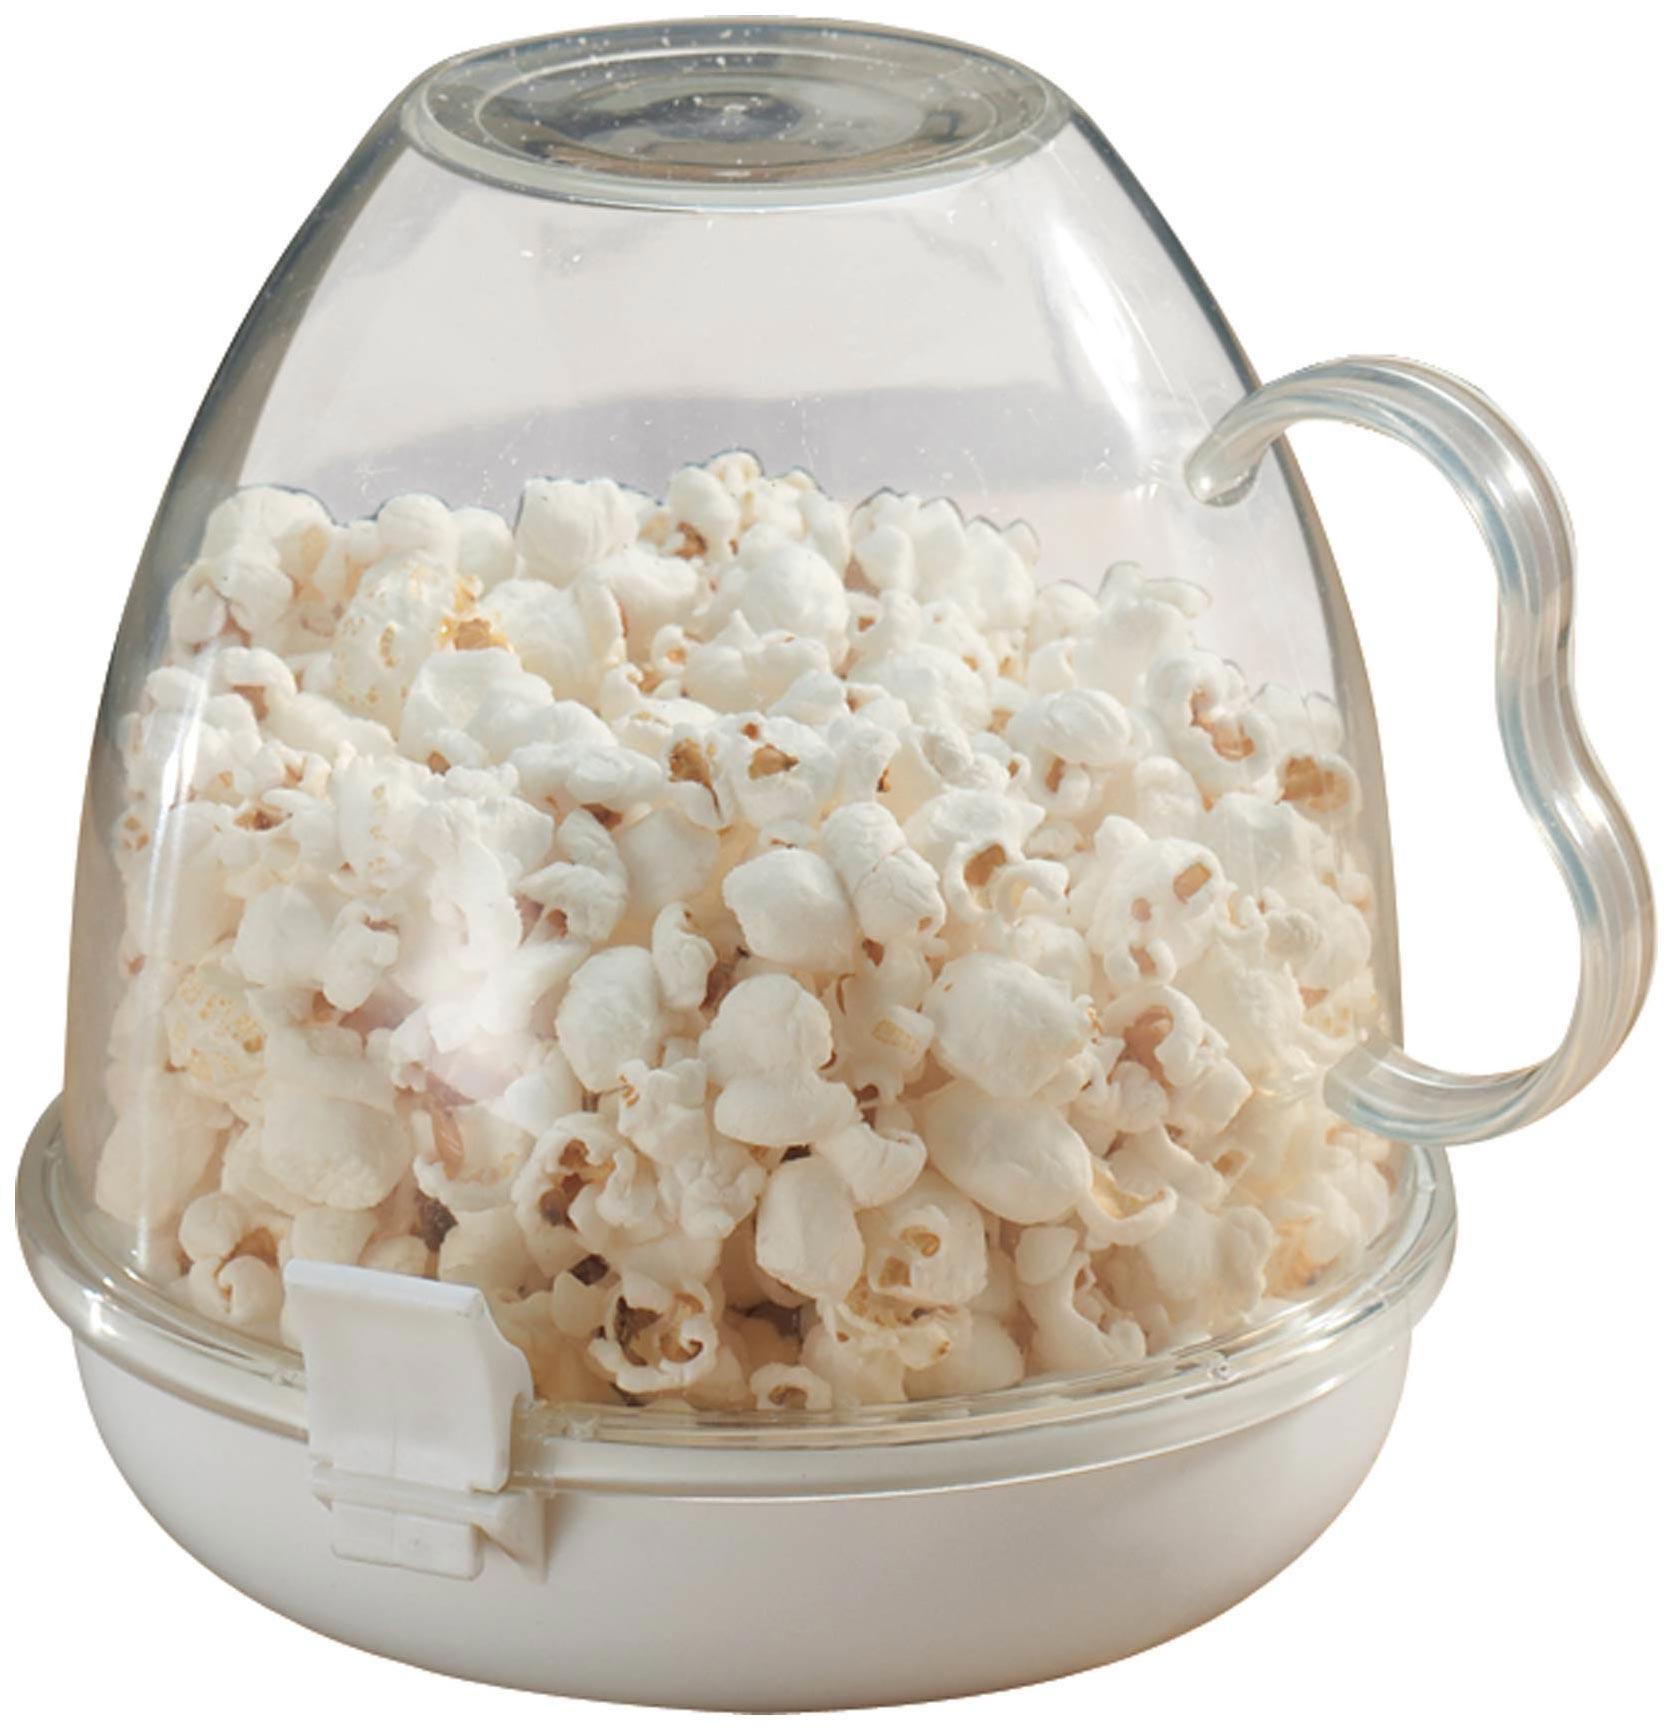 Handled Microwave Popcorn Maker 840853114116 | eBay